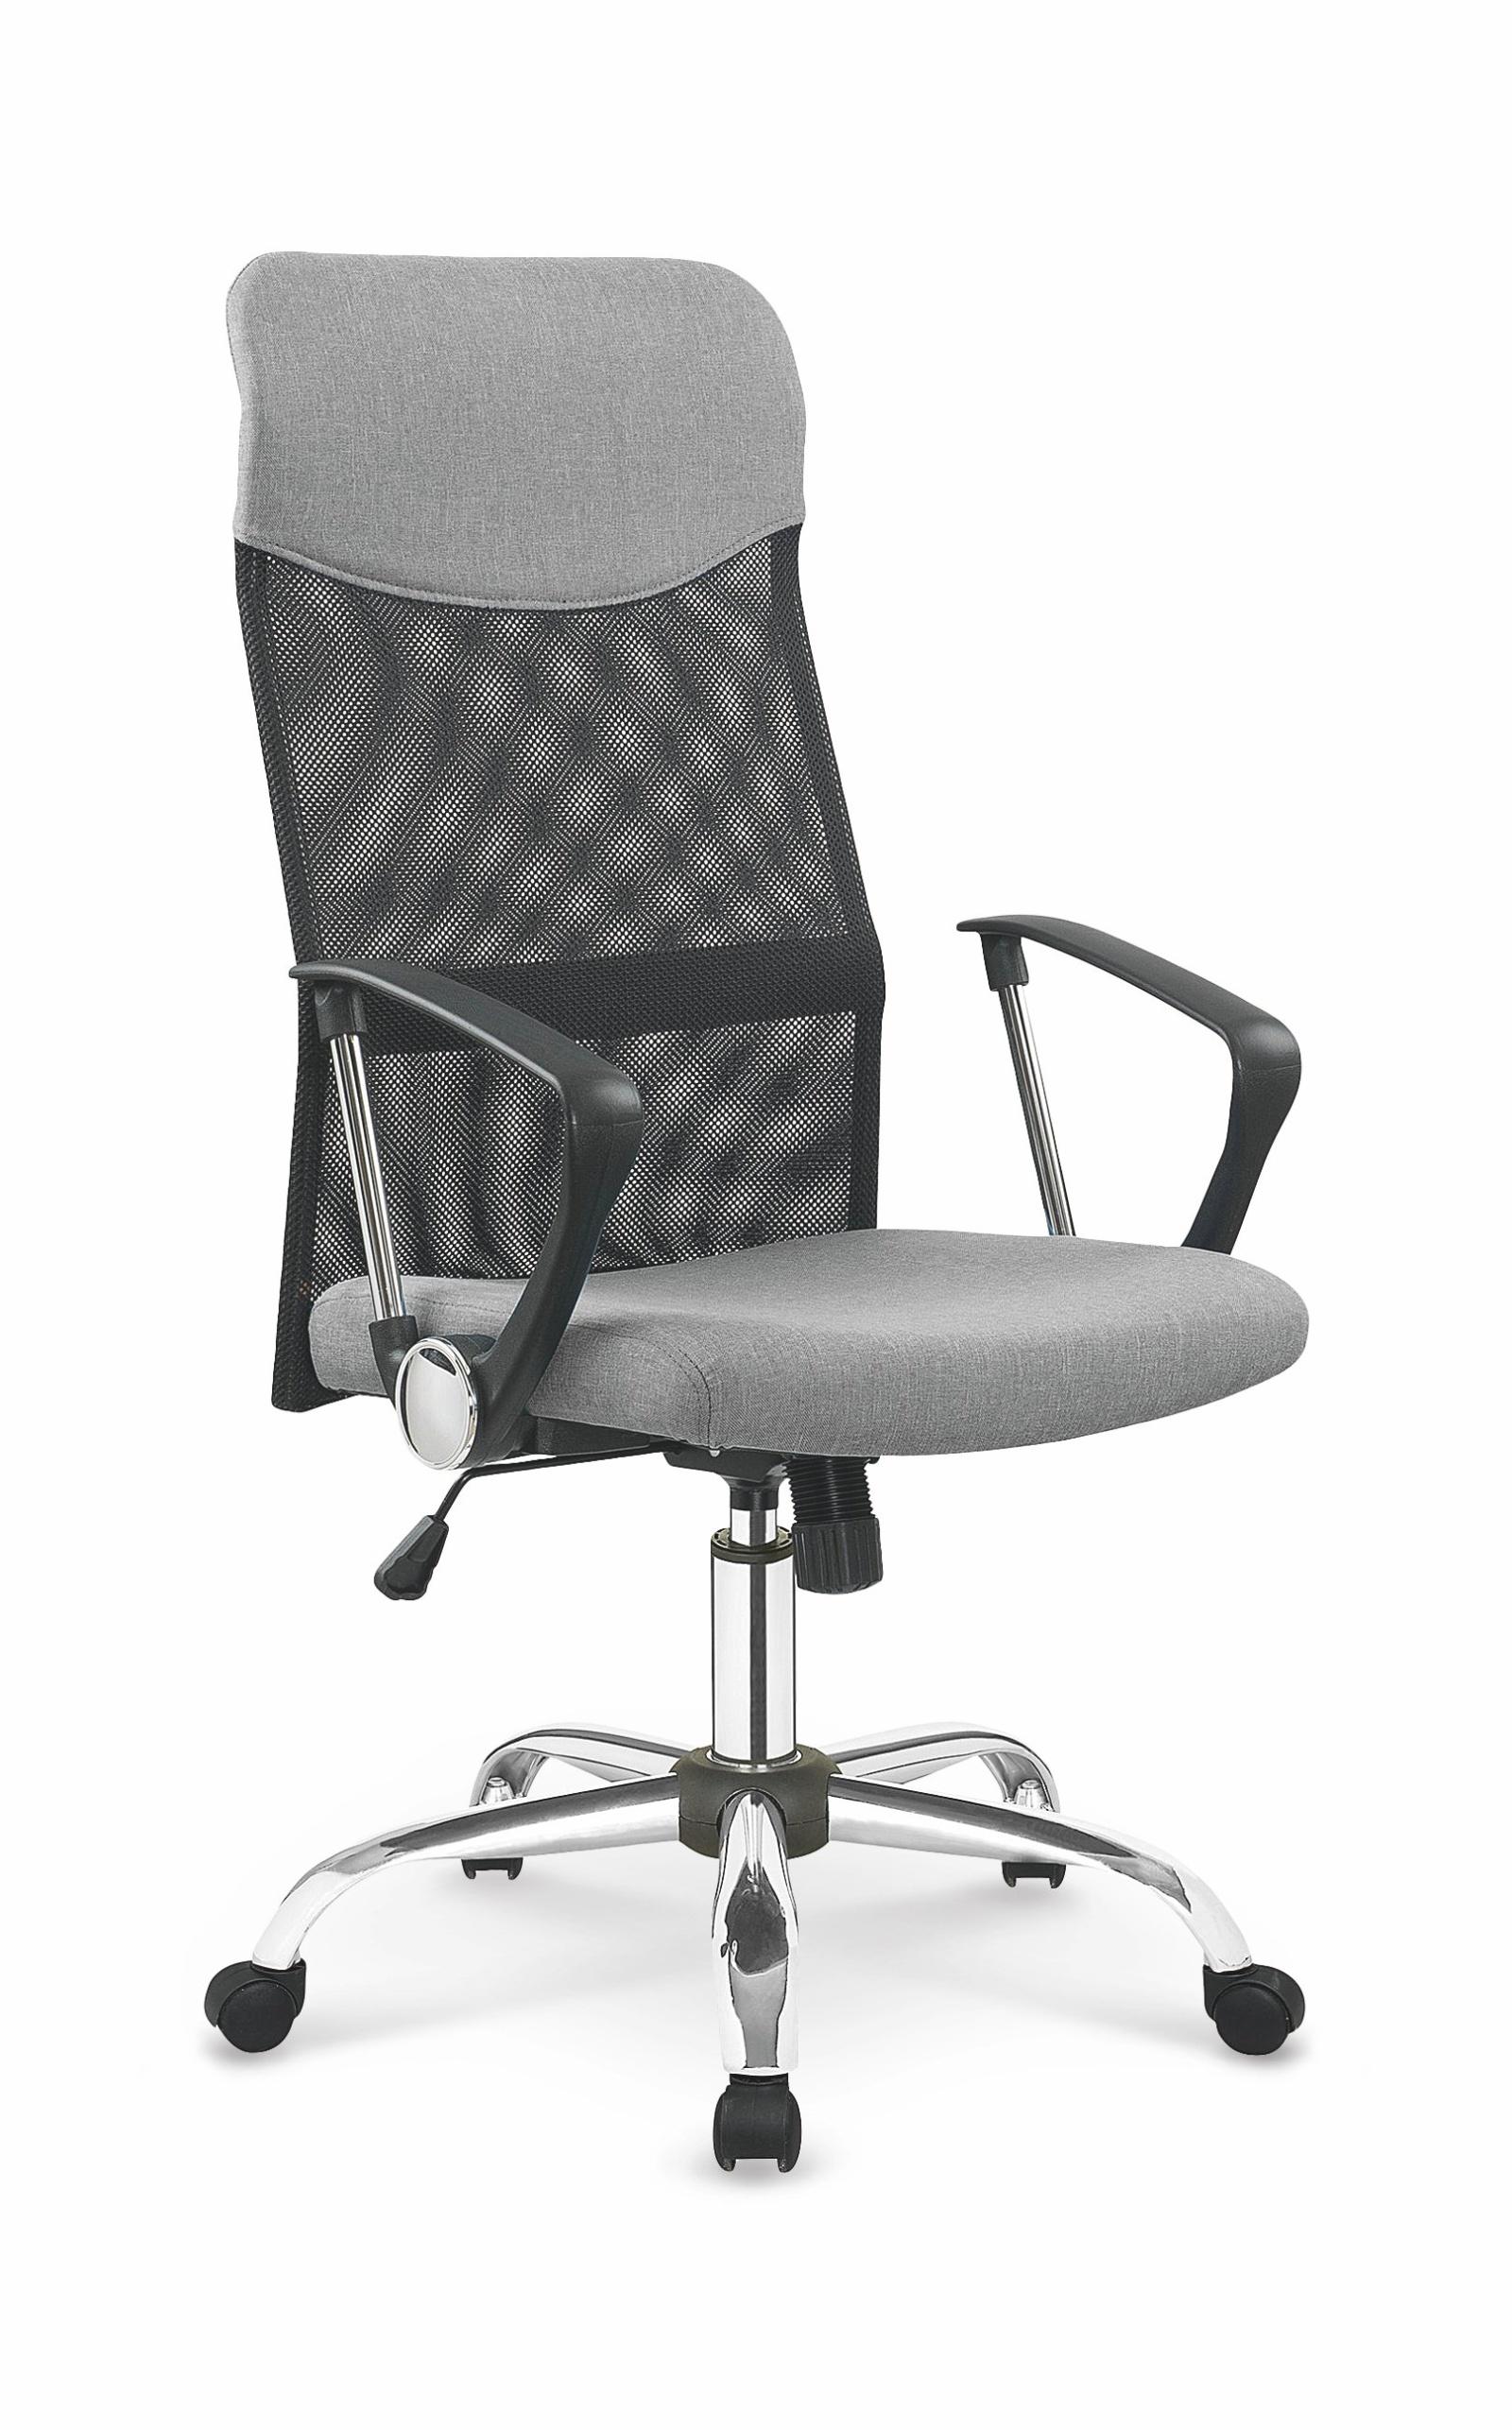 Halmar Kancelářská židle VIRE 2, šedá